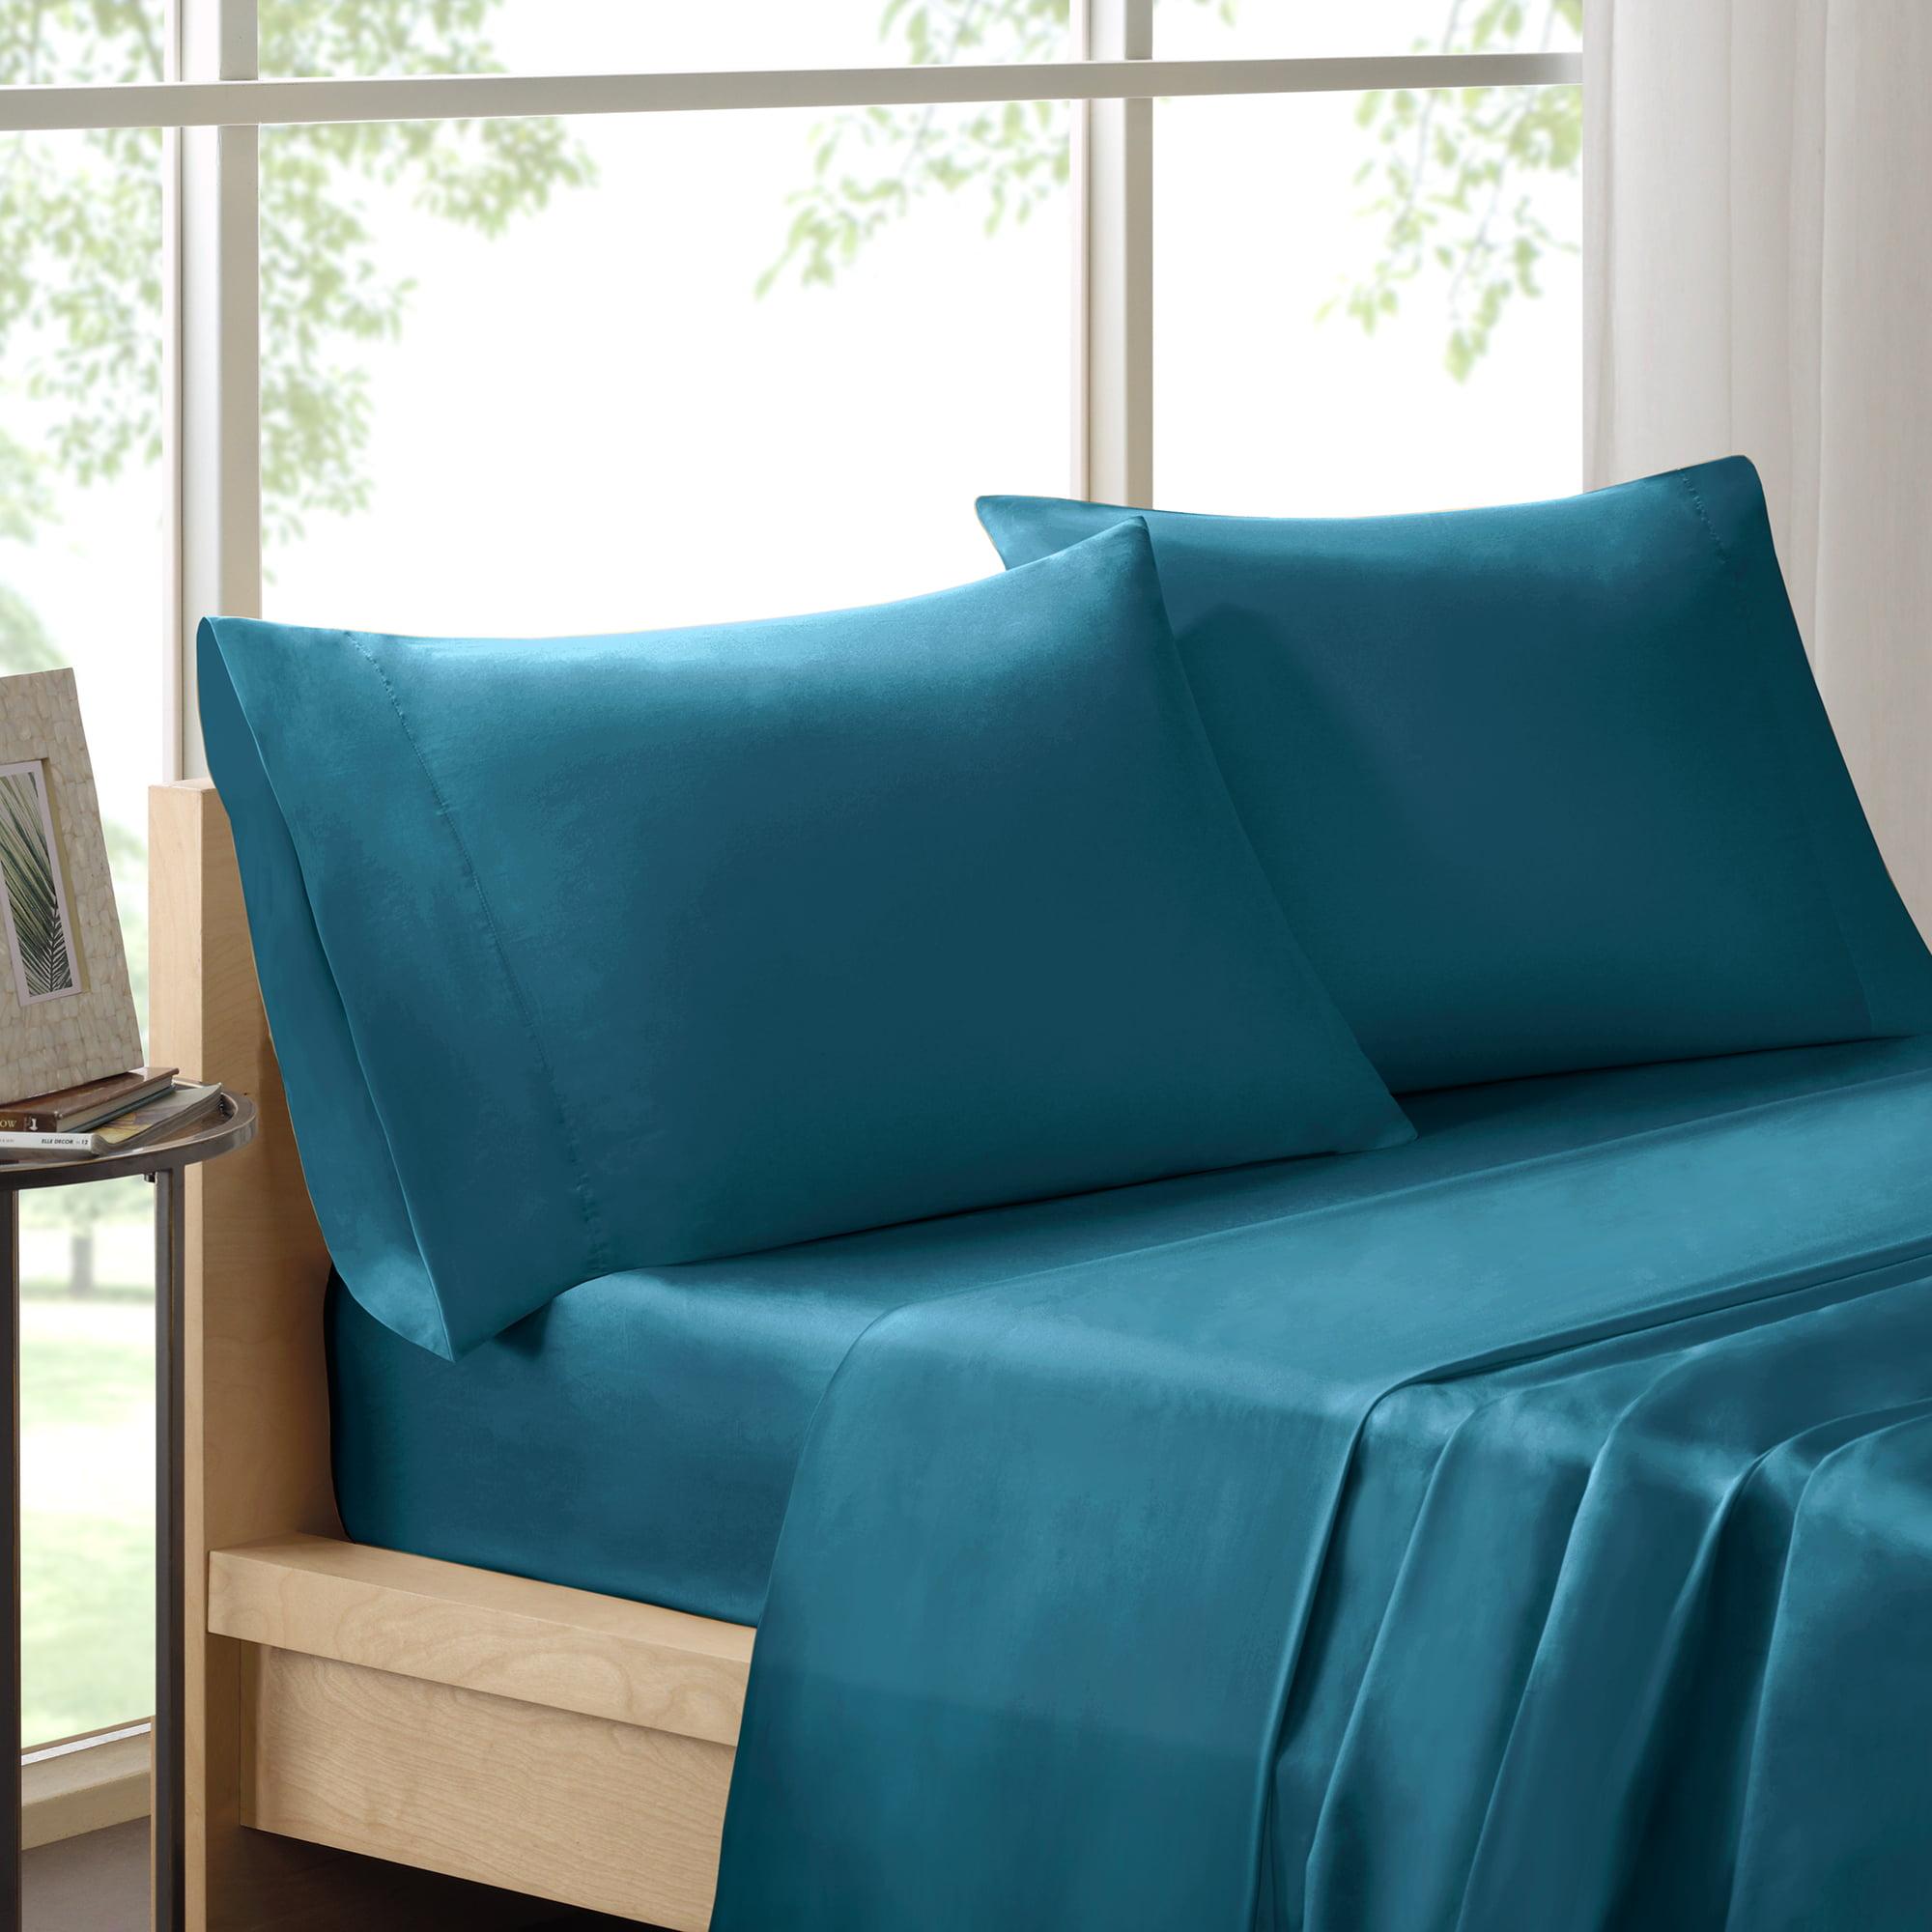 Comfort Classics 300 Thread Count Liquid Cotton Pillowcases